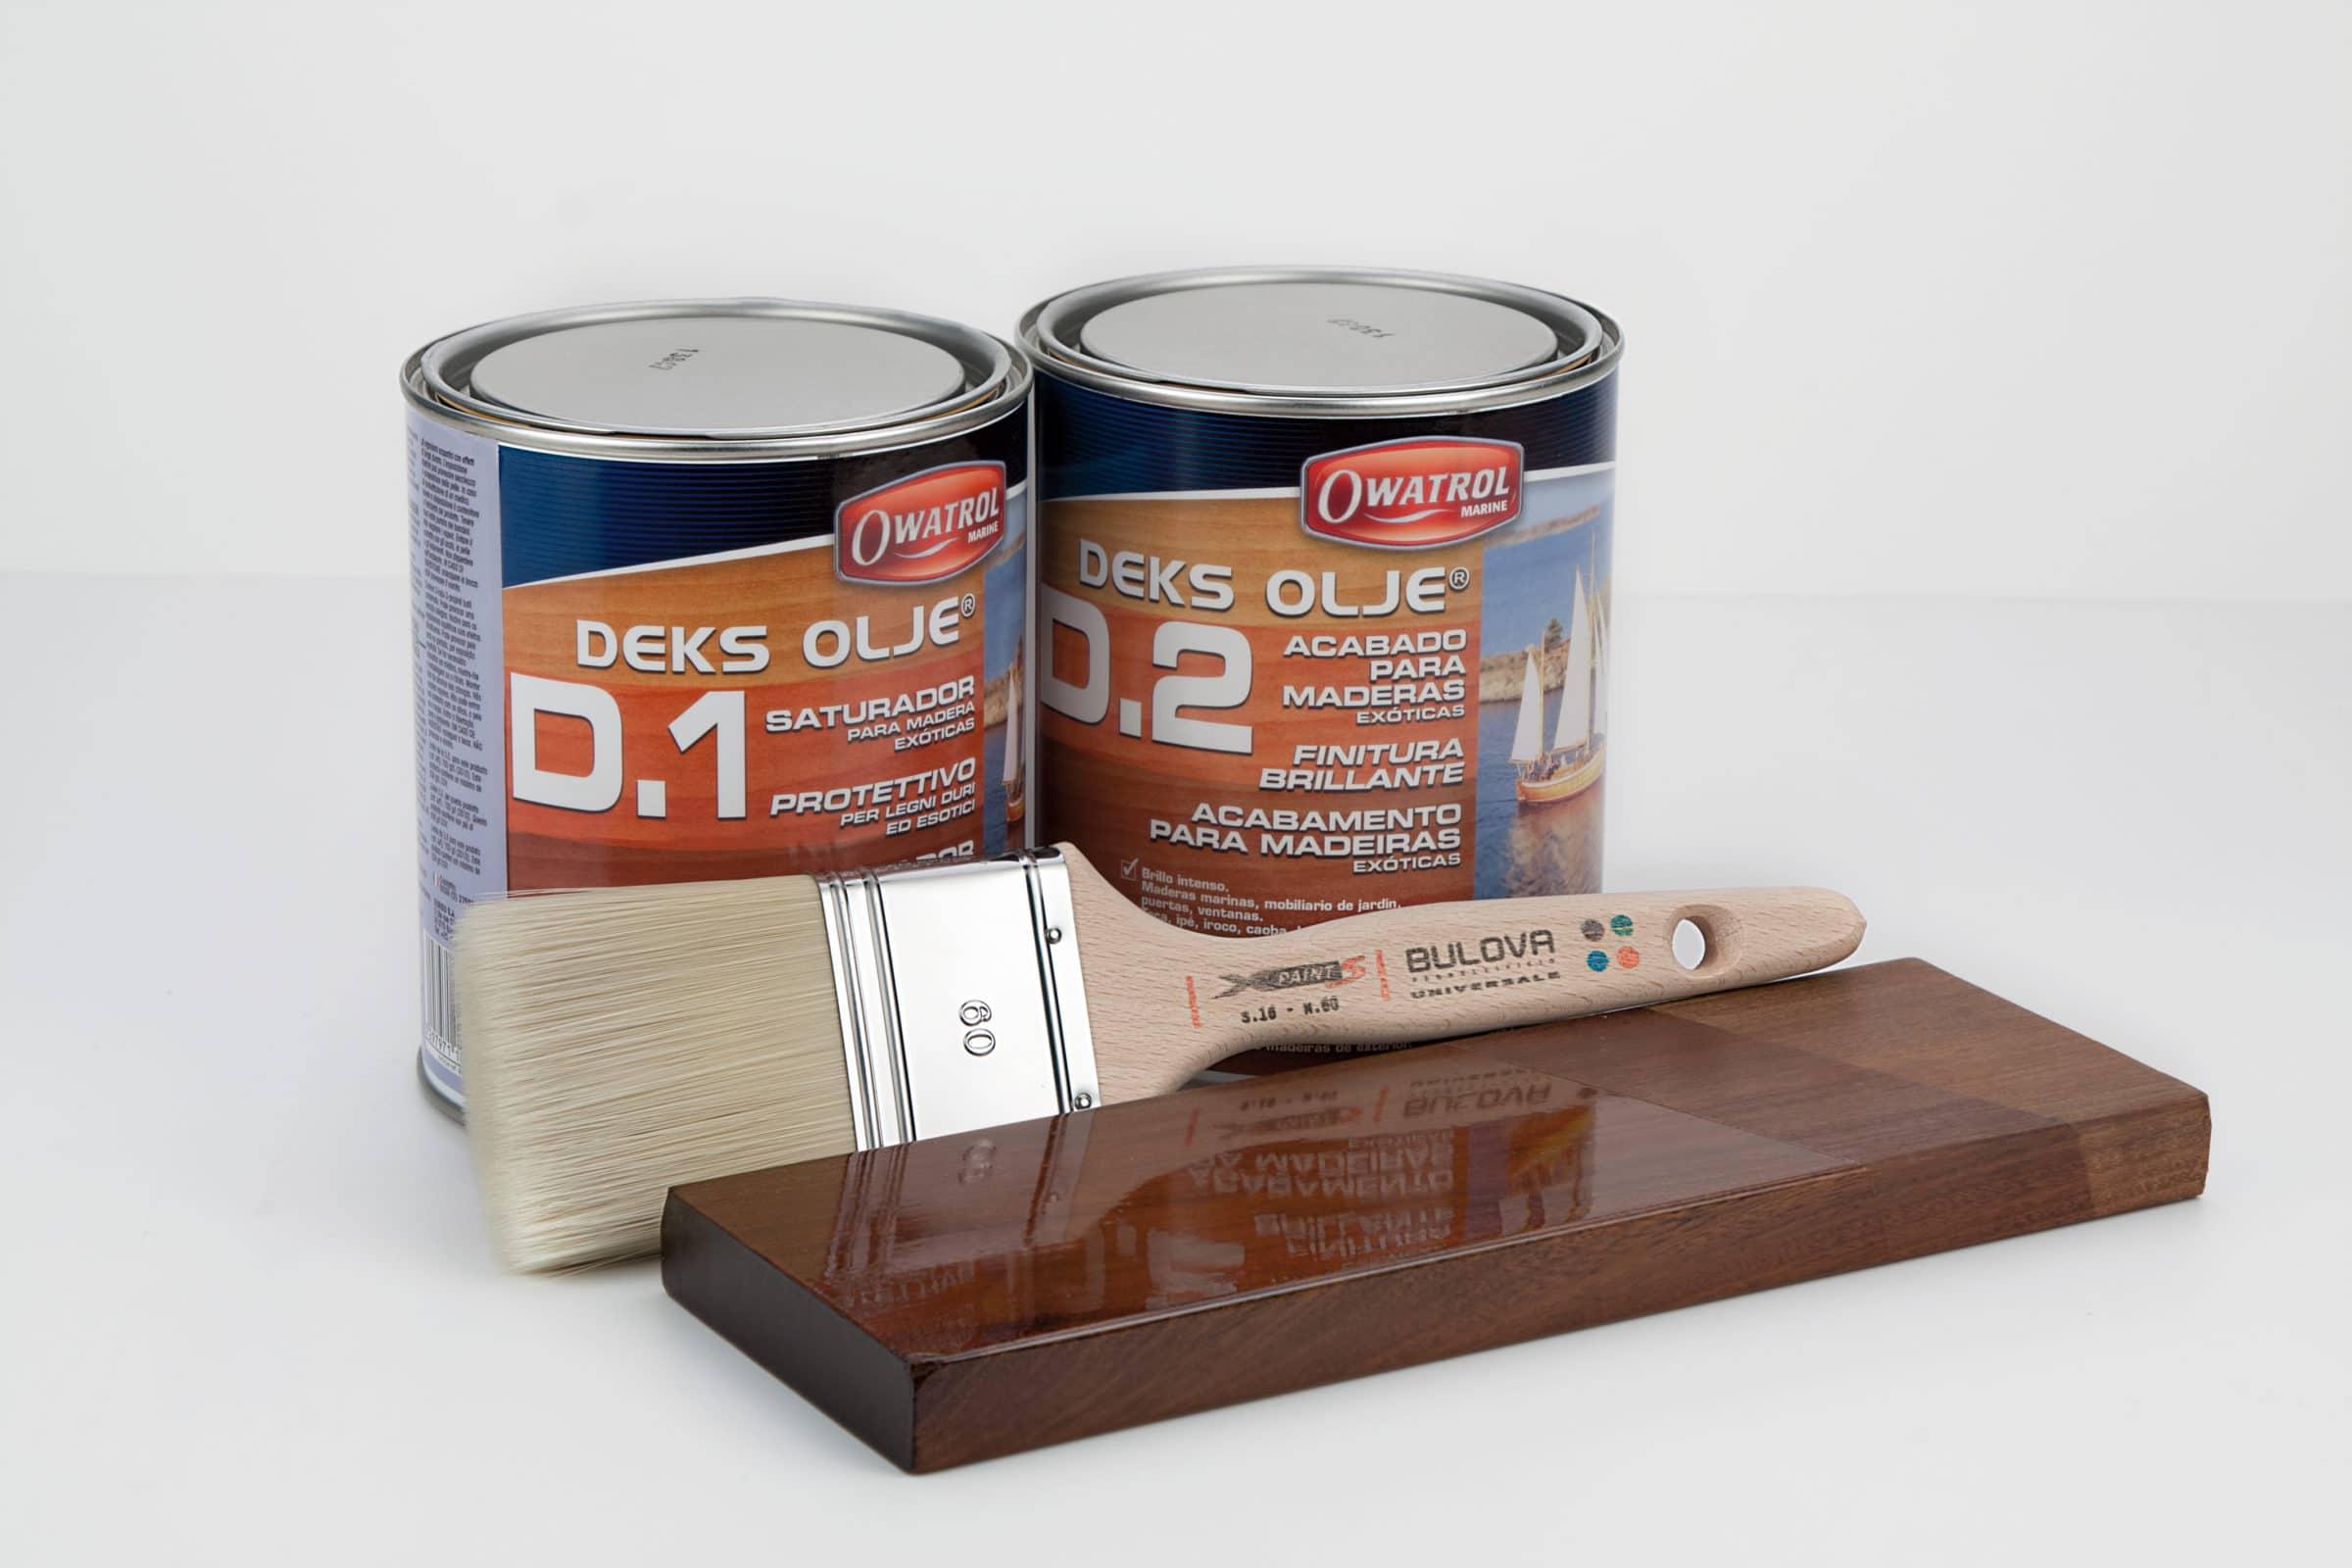 Deks Olje D1 and D2 applied to wood sample